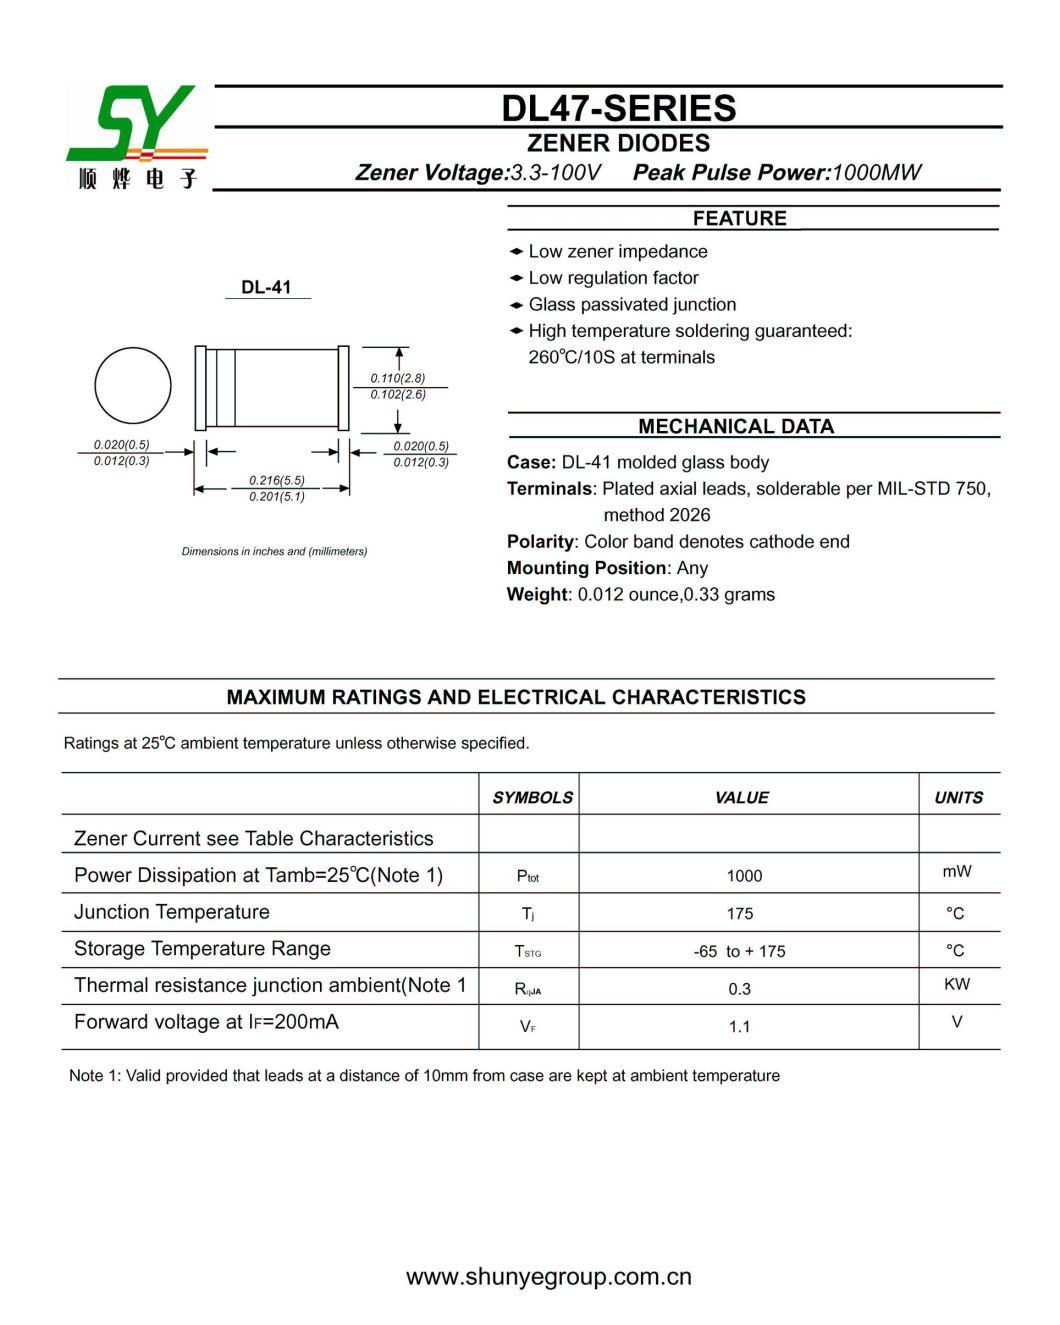 TVS Diodes 5 pieces Transient Voltage Suppressors TVS DIODE 56V @ 6A